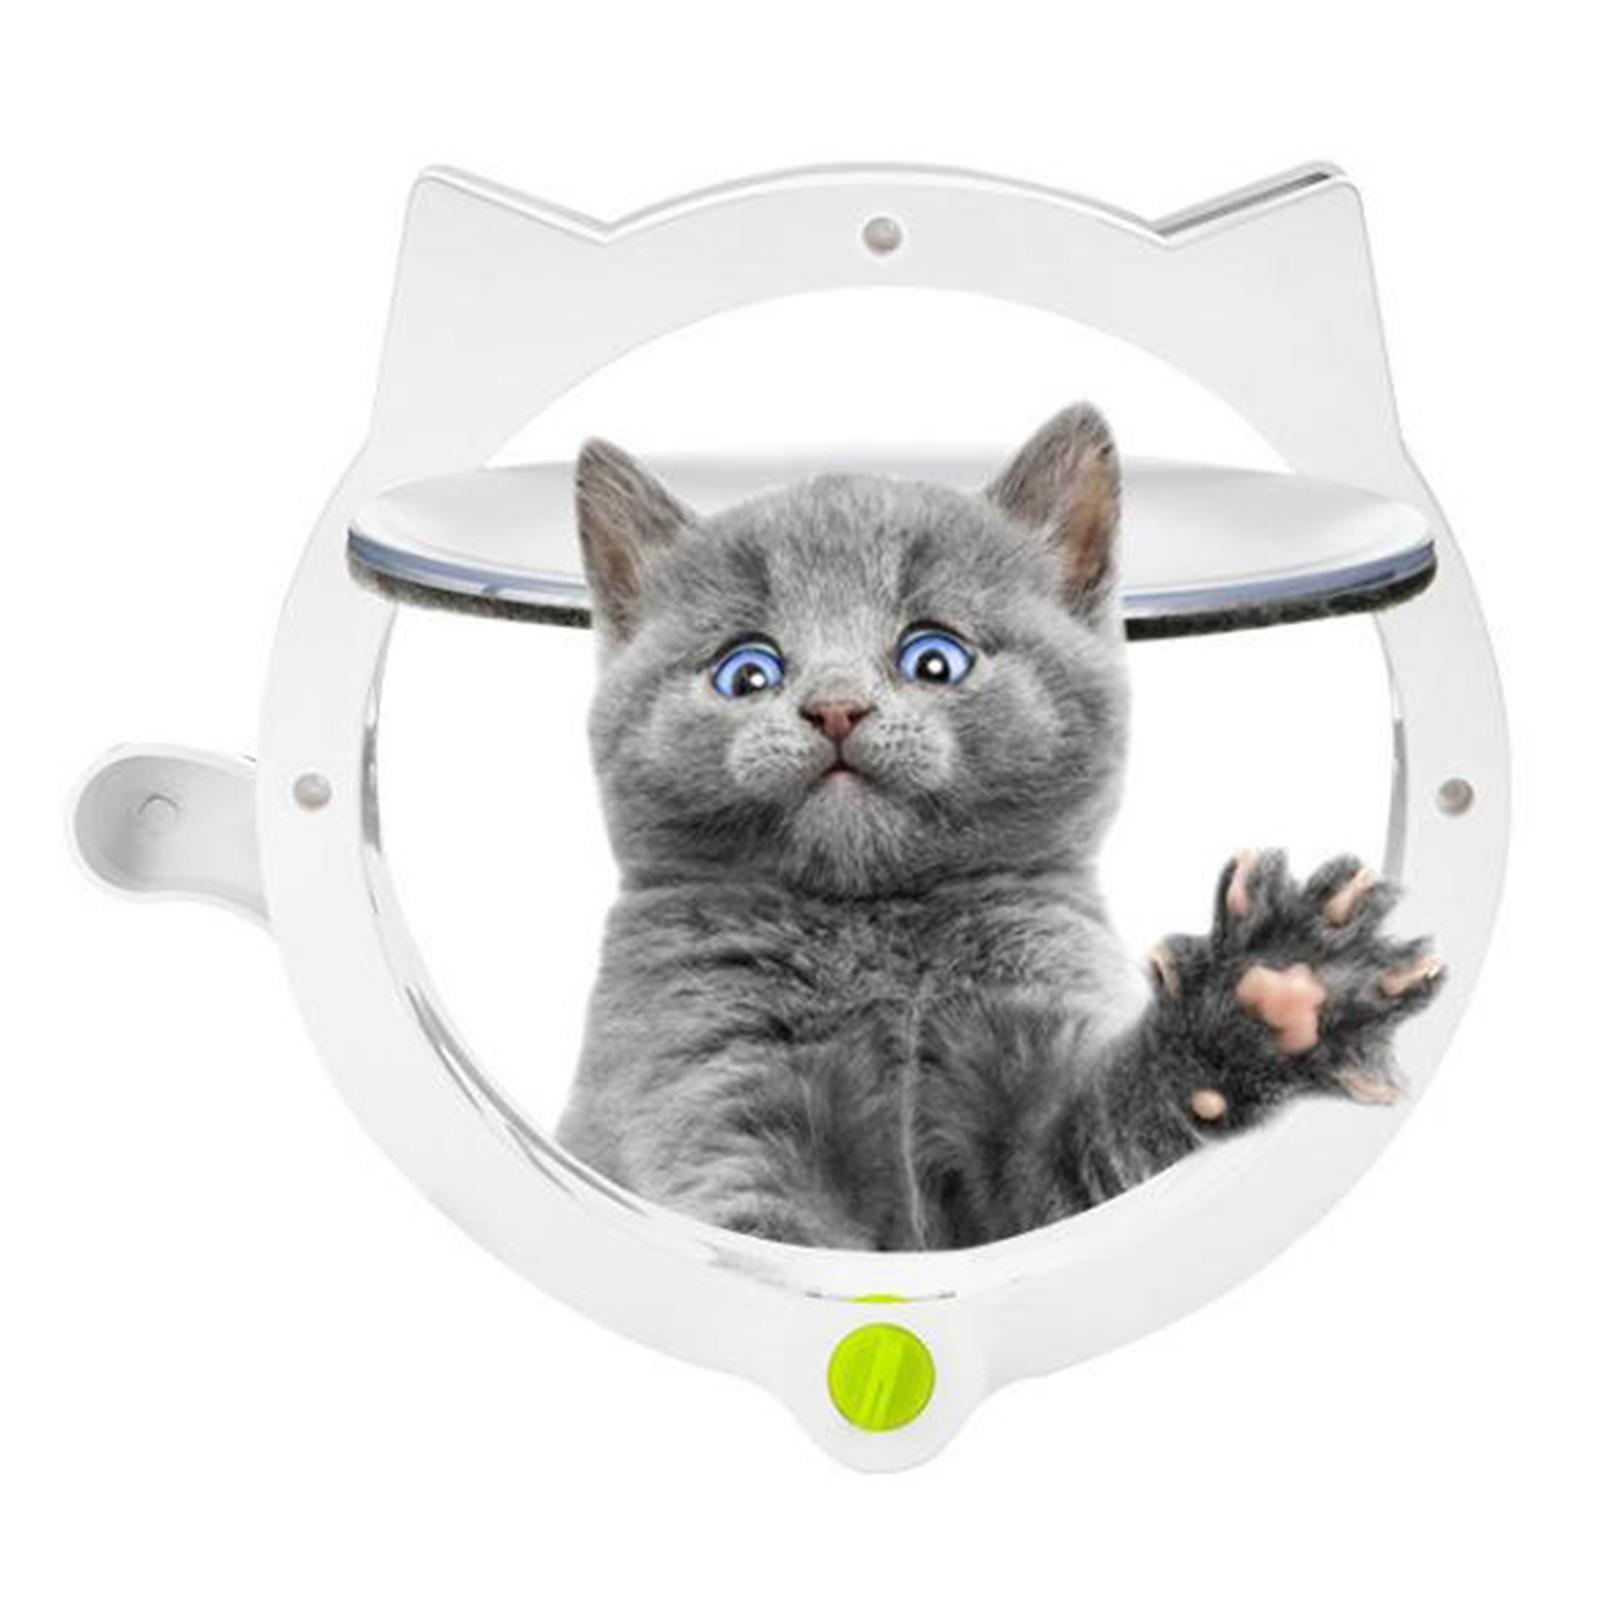 Cat Door For Pets With 4 Way Locking Cat Flap For Interior Exterior Doors Wall Ebay